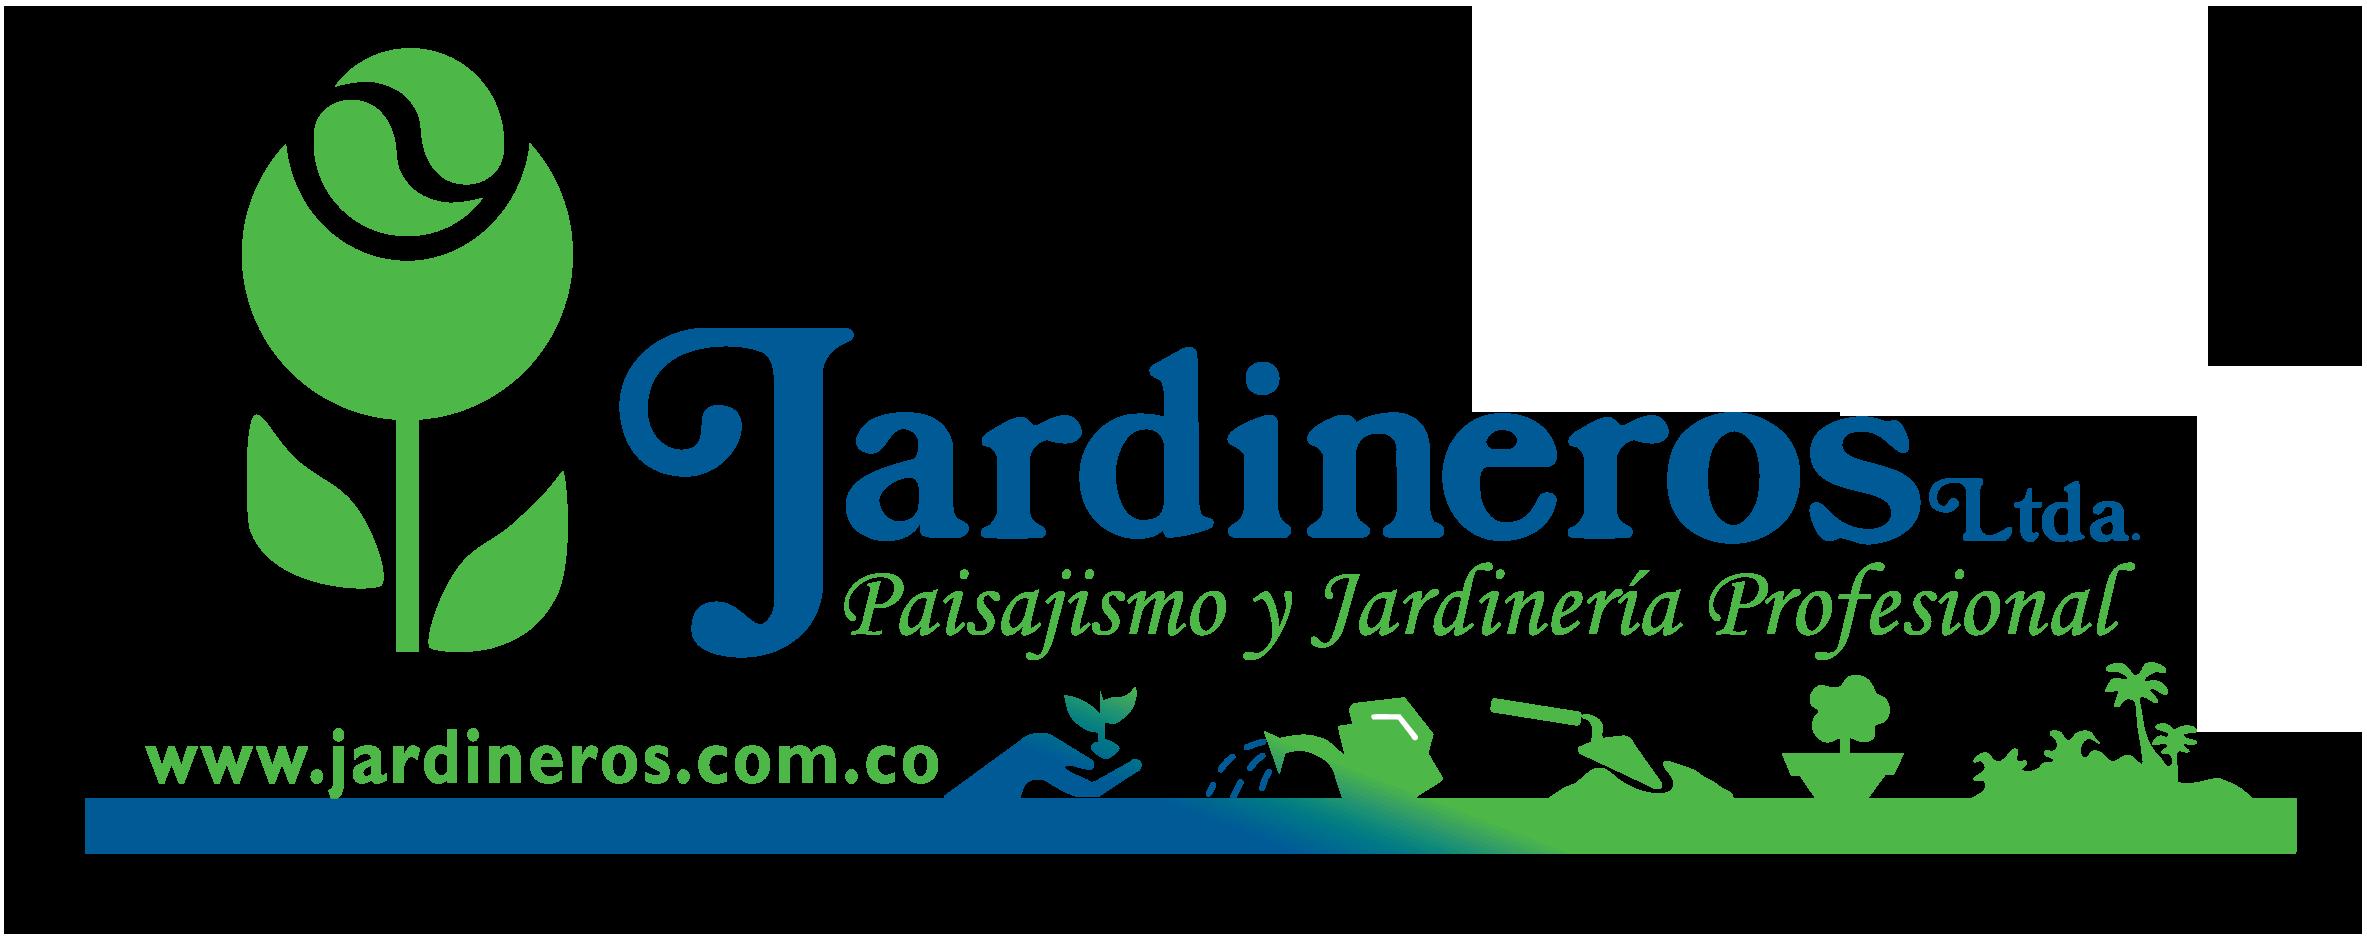 Jardineros_